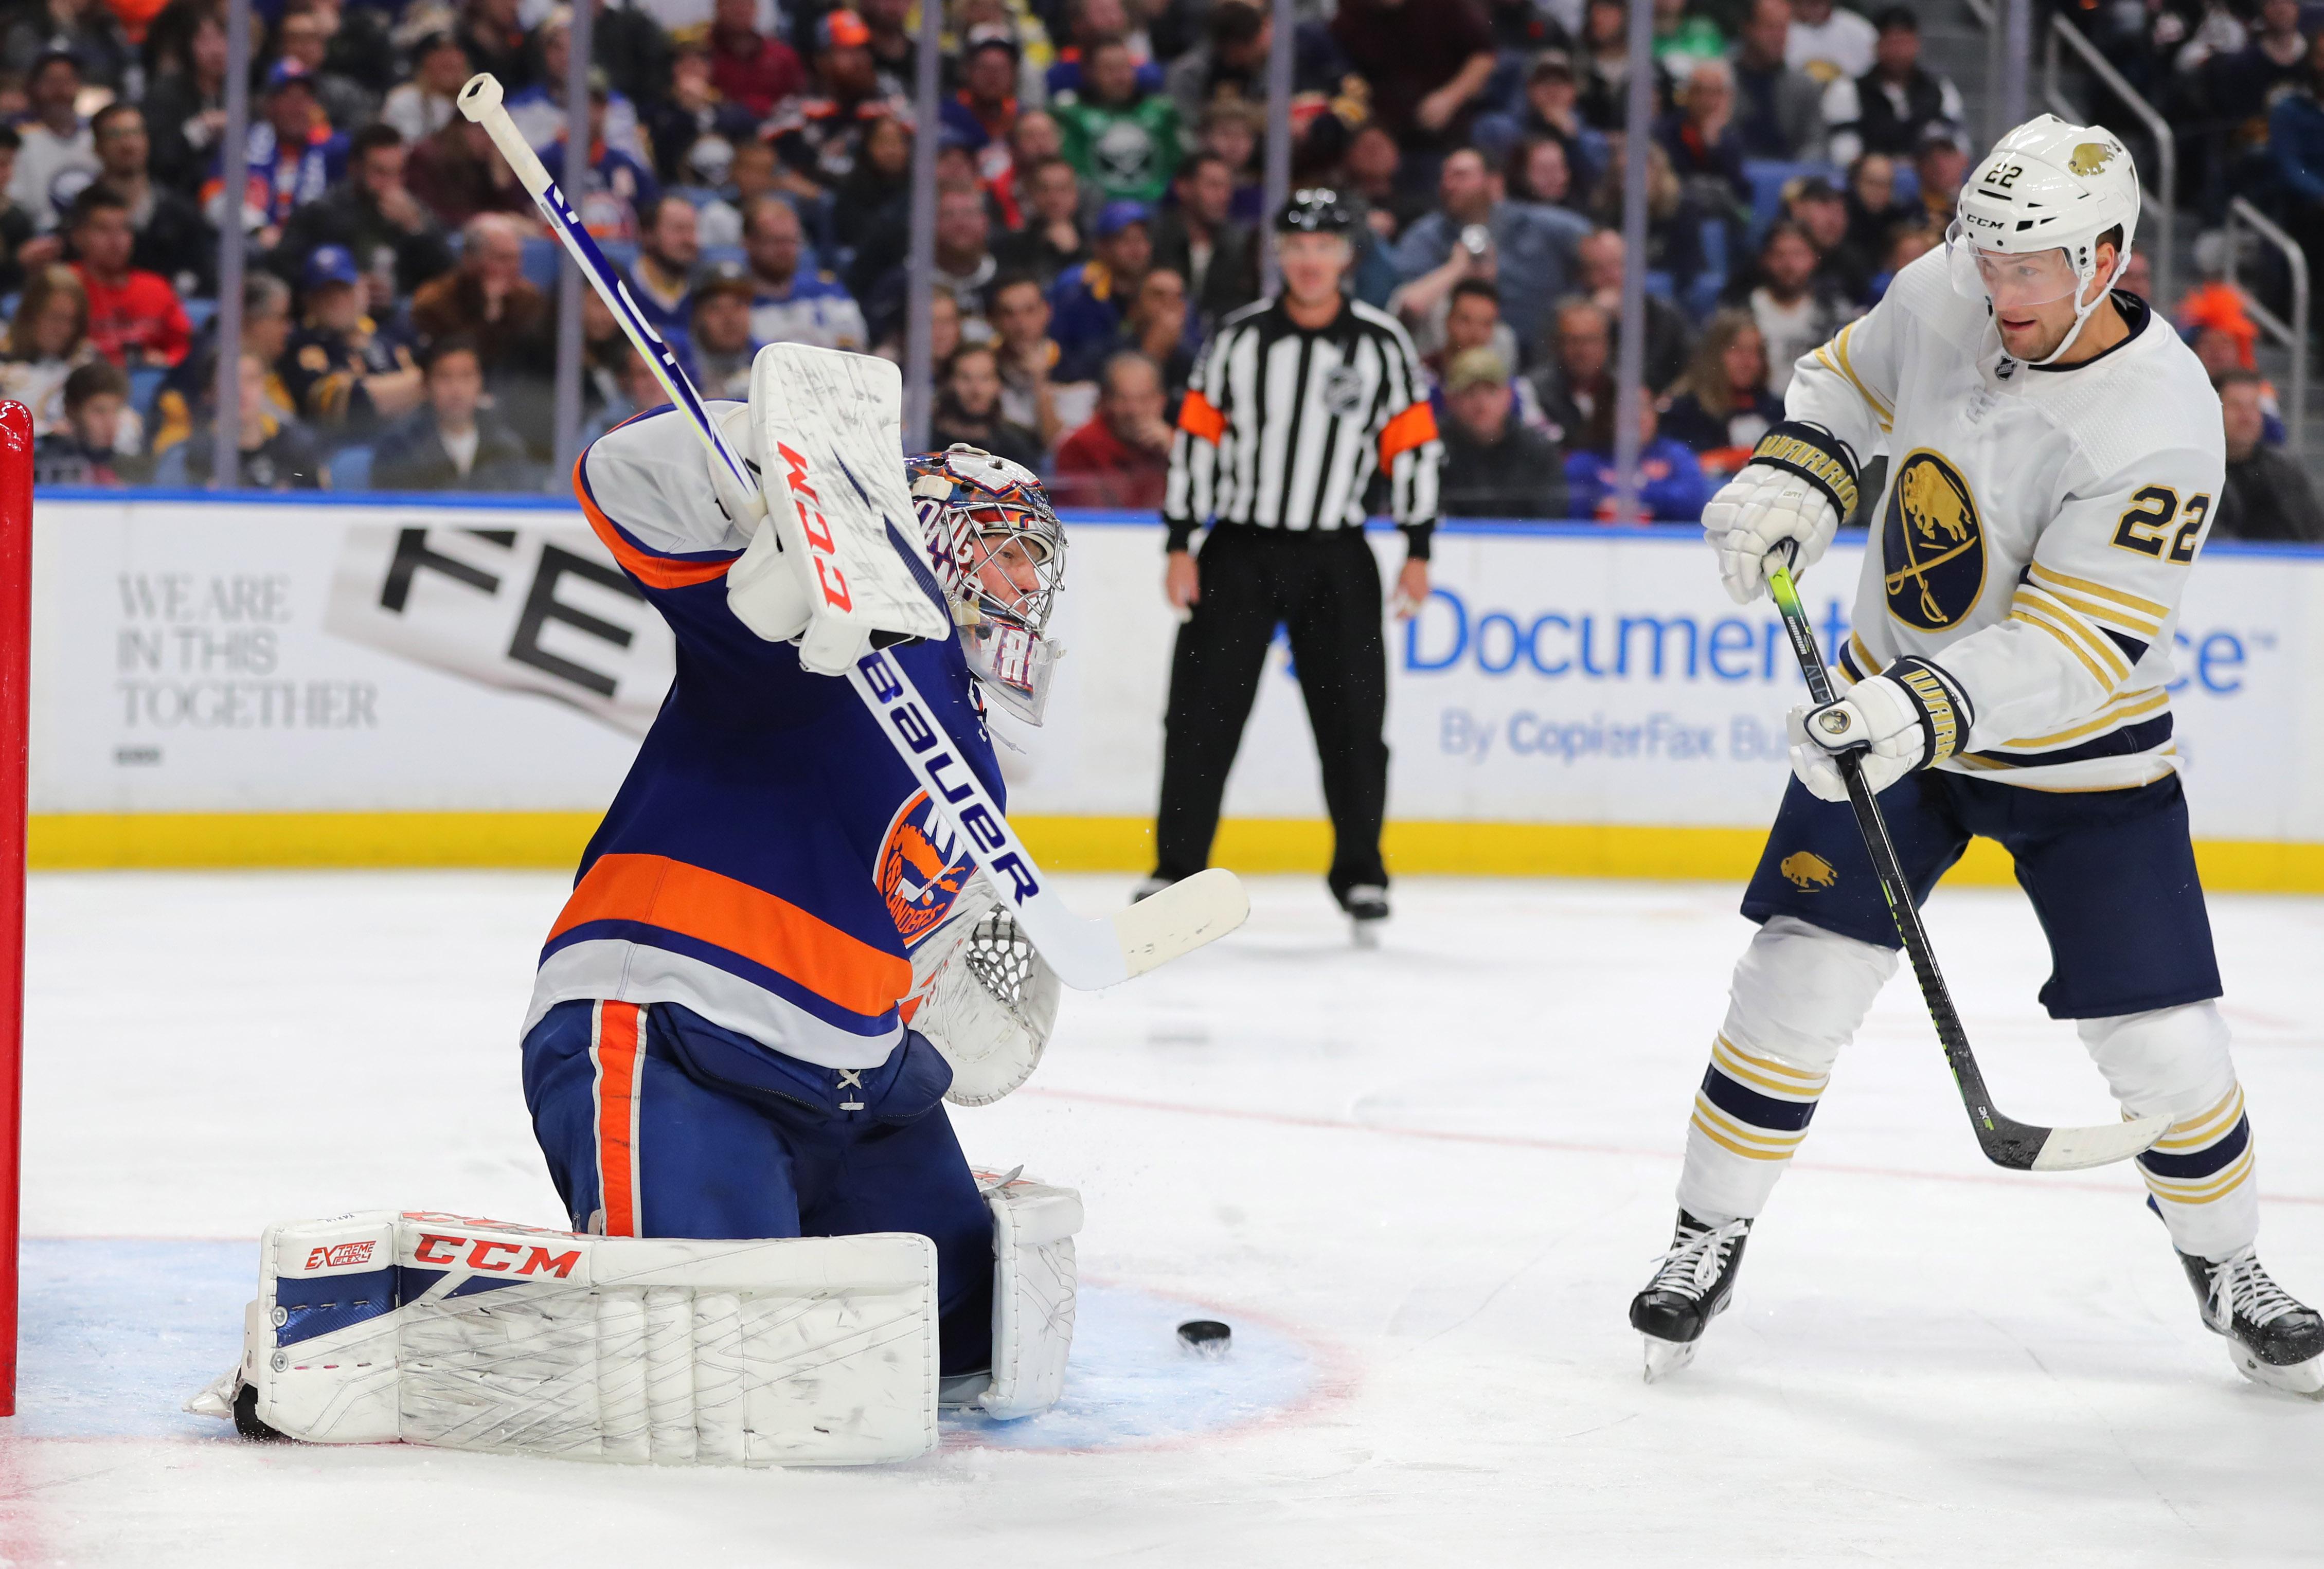 Nov 2, 2019; Buffalo, NY, USA; Buffalo Sabres left wing Johan Larsson (22) deflects a shot on New York Islanders goaltender Semyon Varlamov (40) during the second period at KeyBank Center. Mandatory Credit: Timothy T. Ludwig-USA TODAY Sports